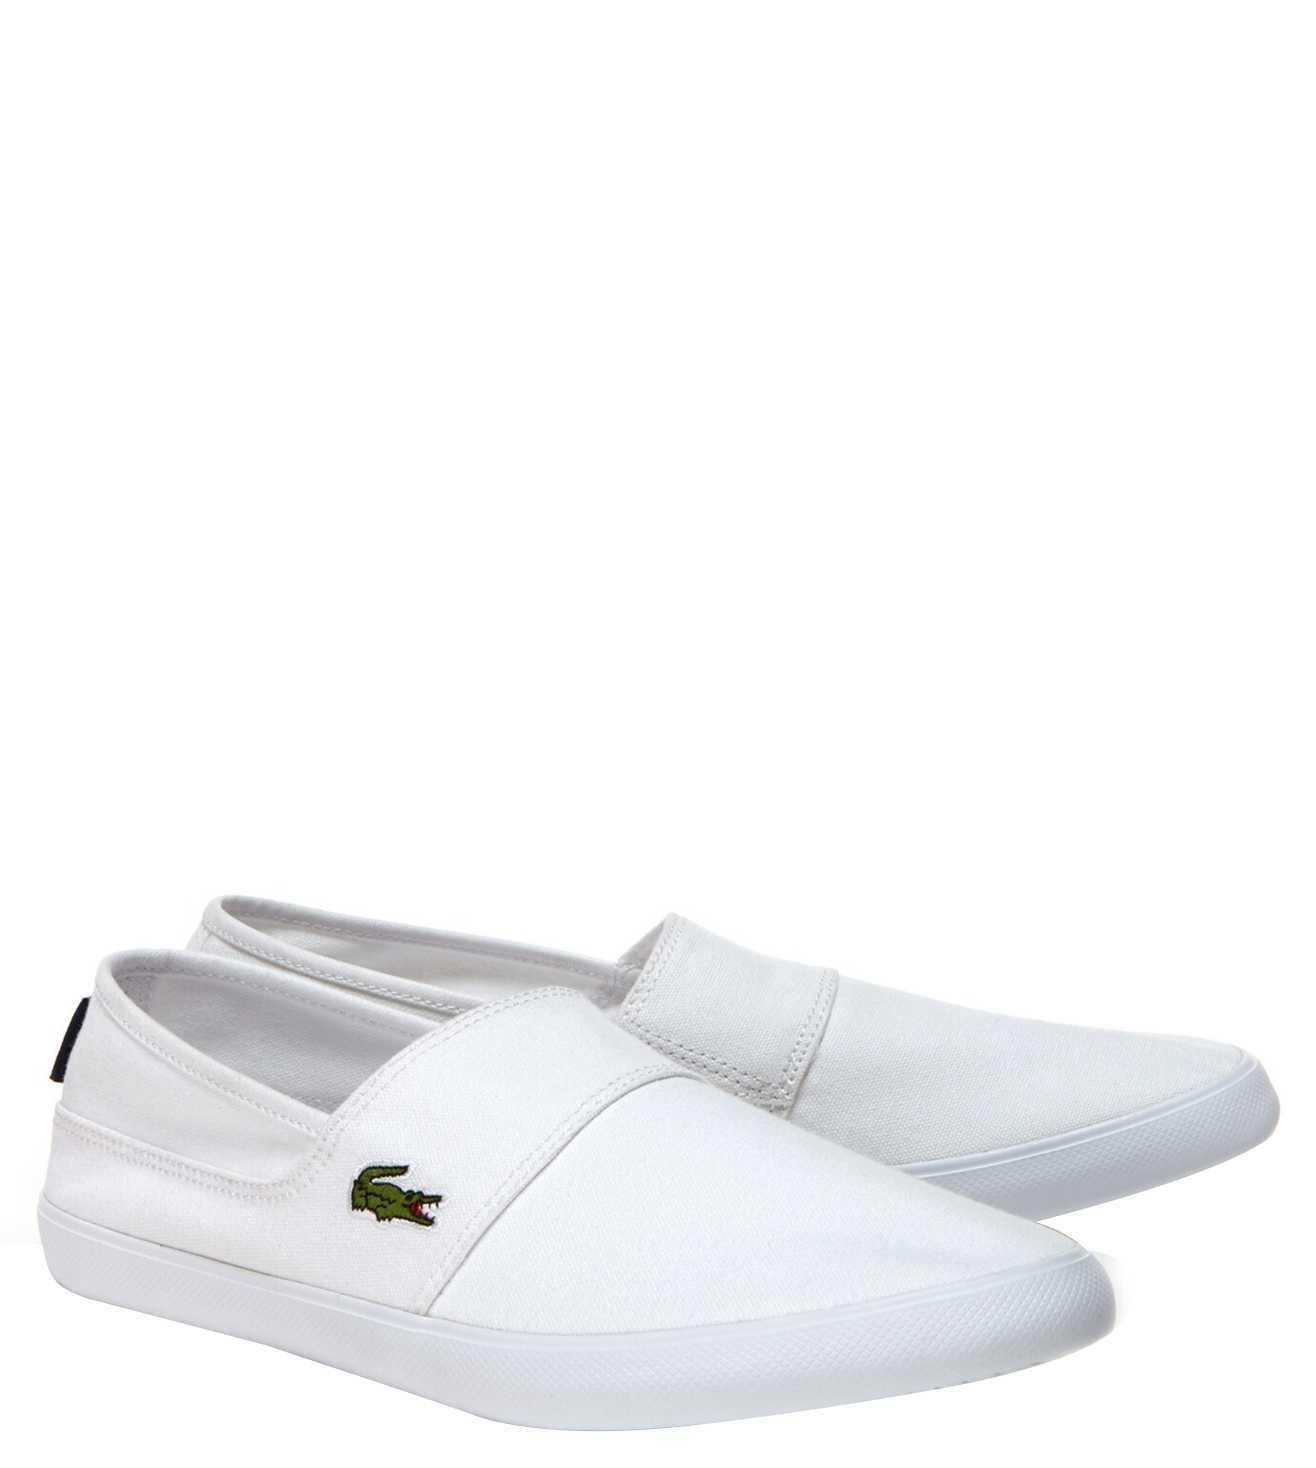 Buy Lacoste White Marice Canvas Slip-On